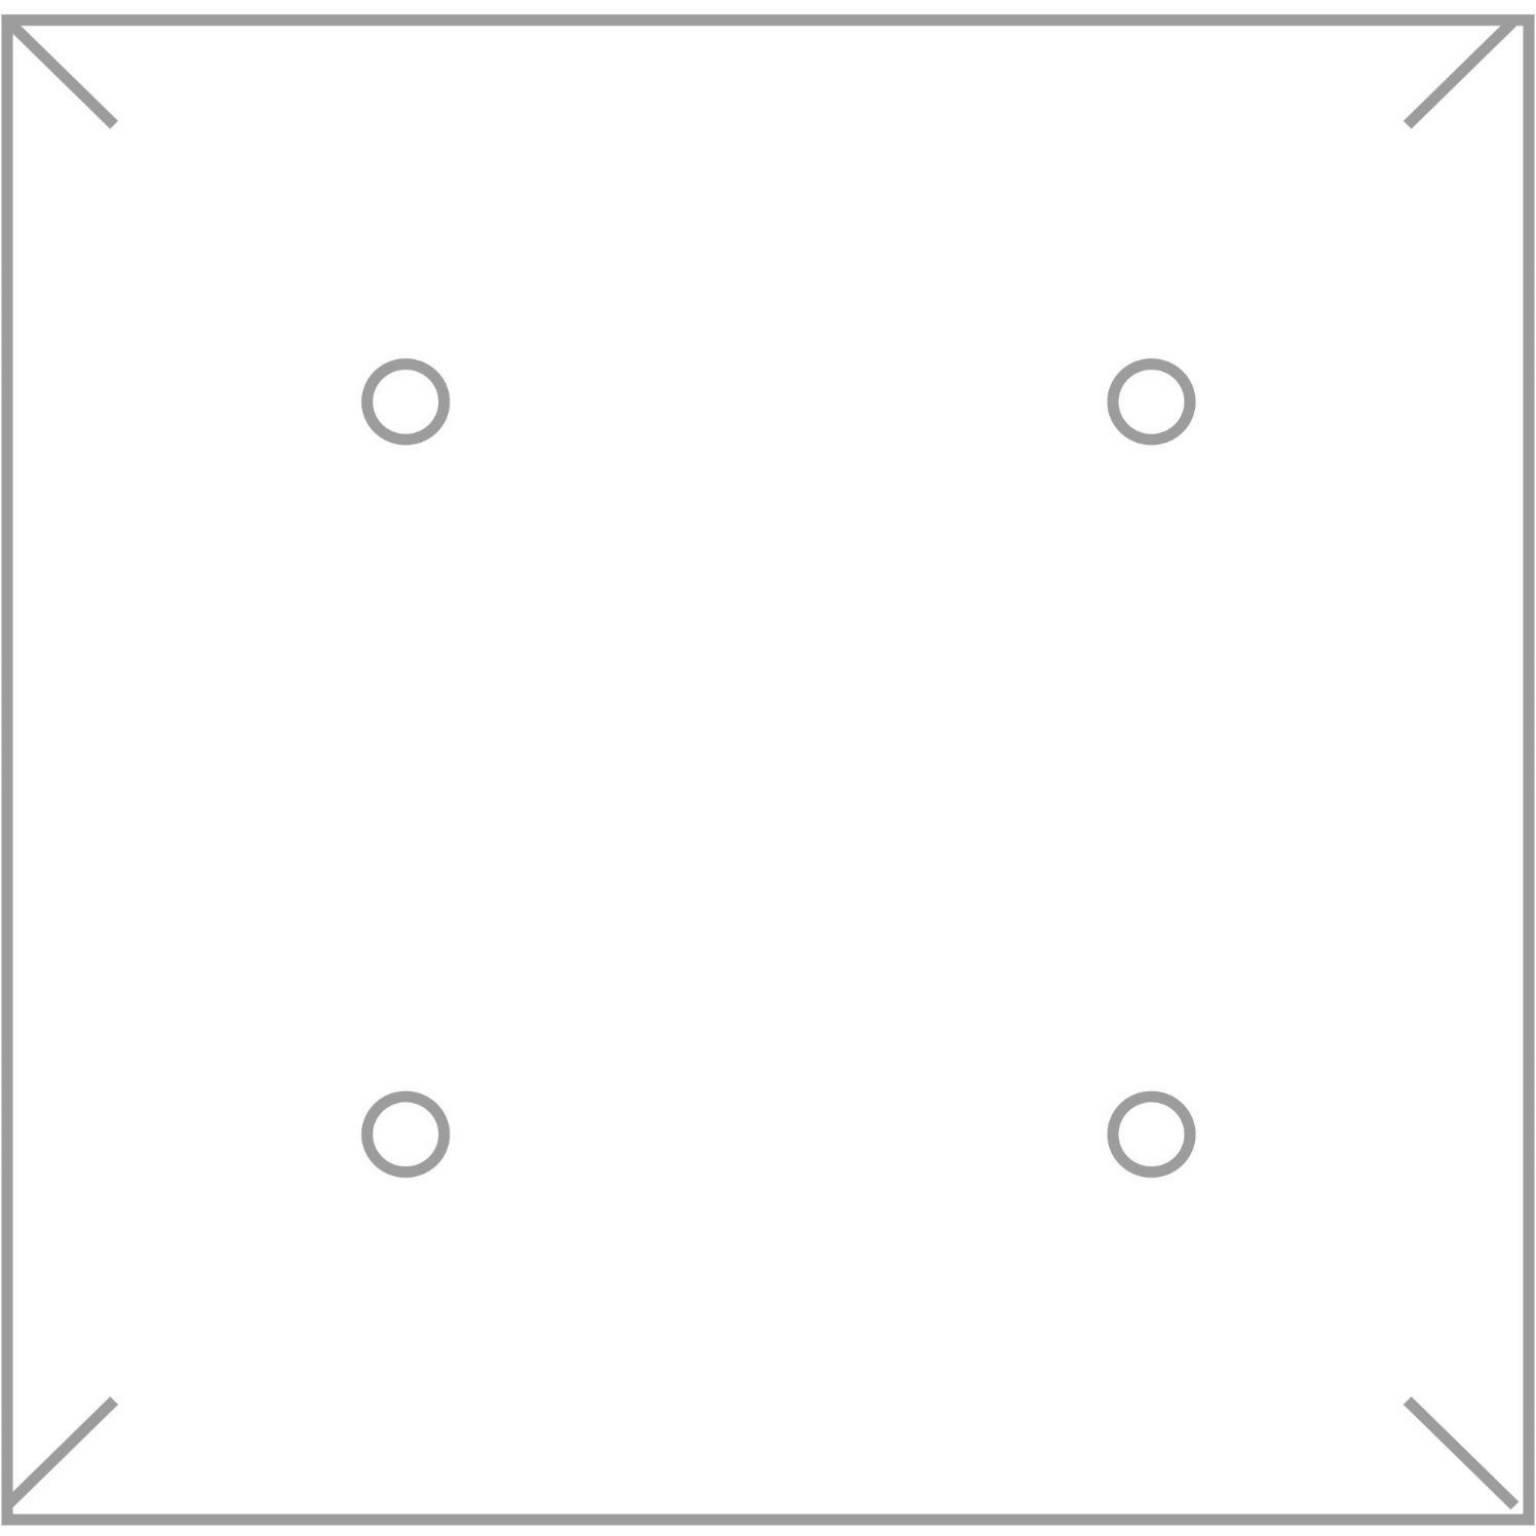 Mod. Tc-2 | Duralmond